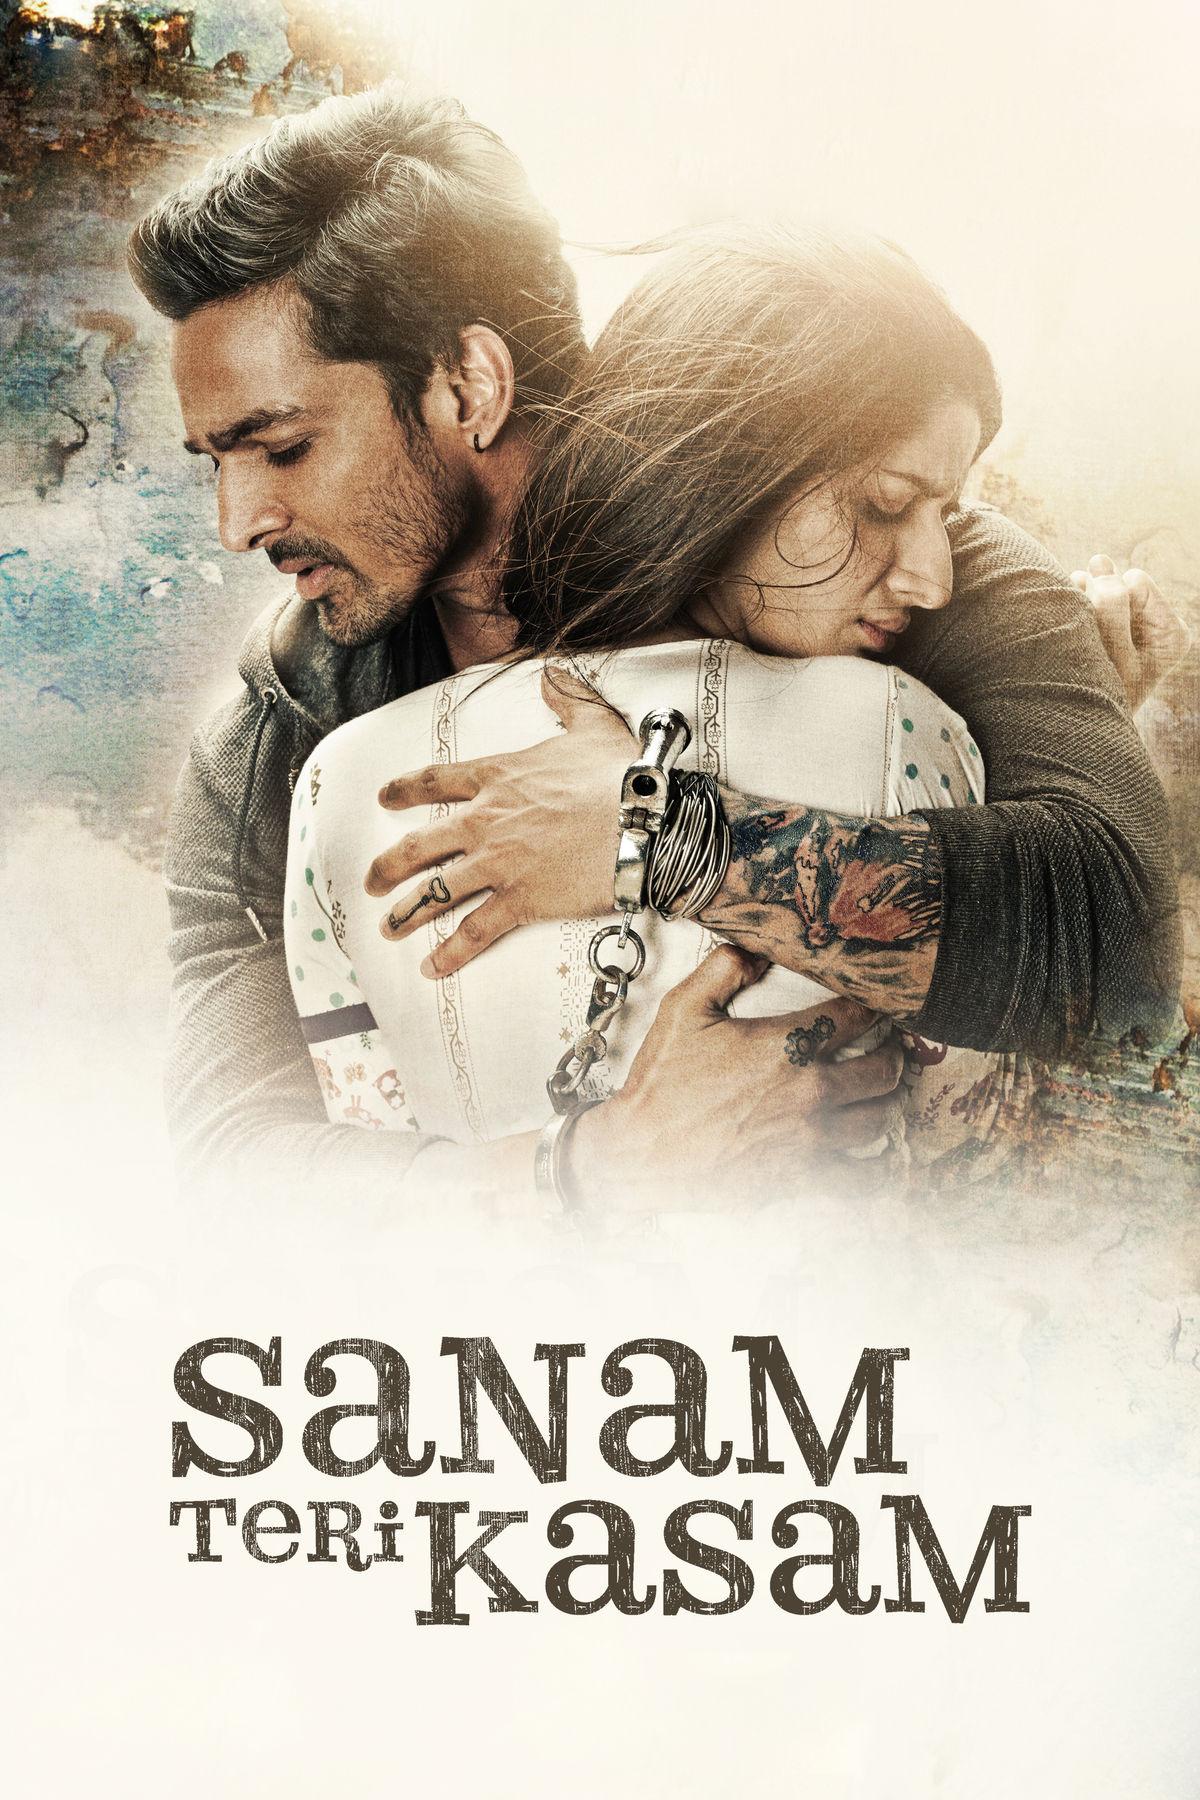 Harshvardhan Rane Best Movies, TV Shows and Web Series List